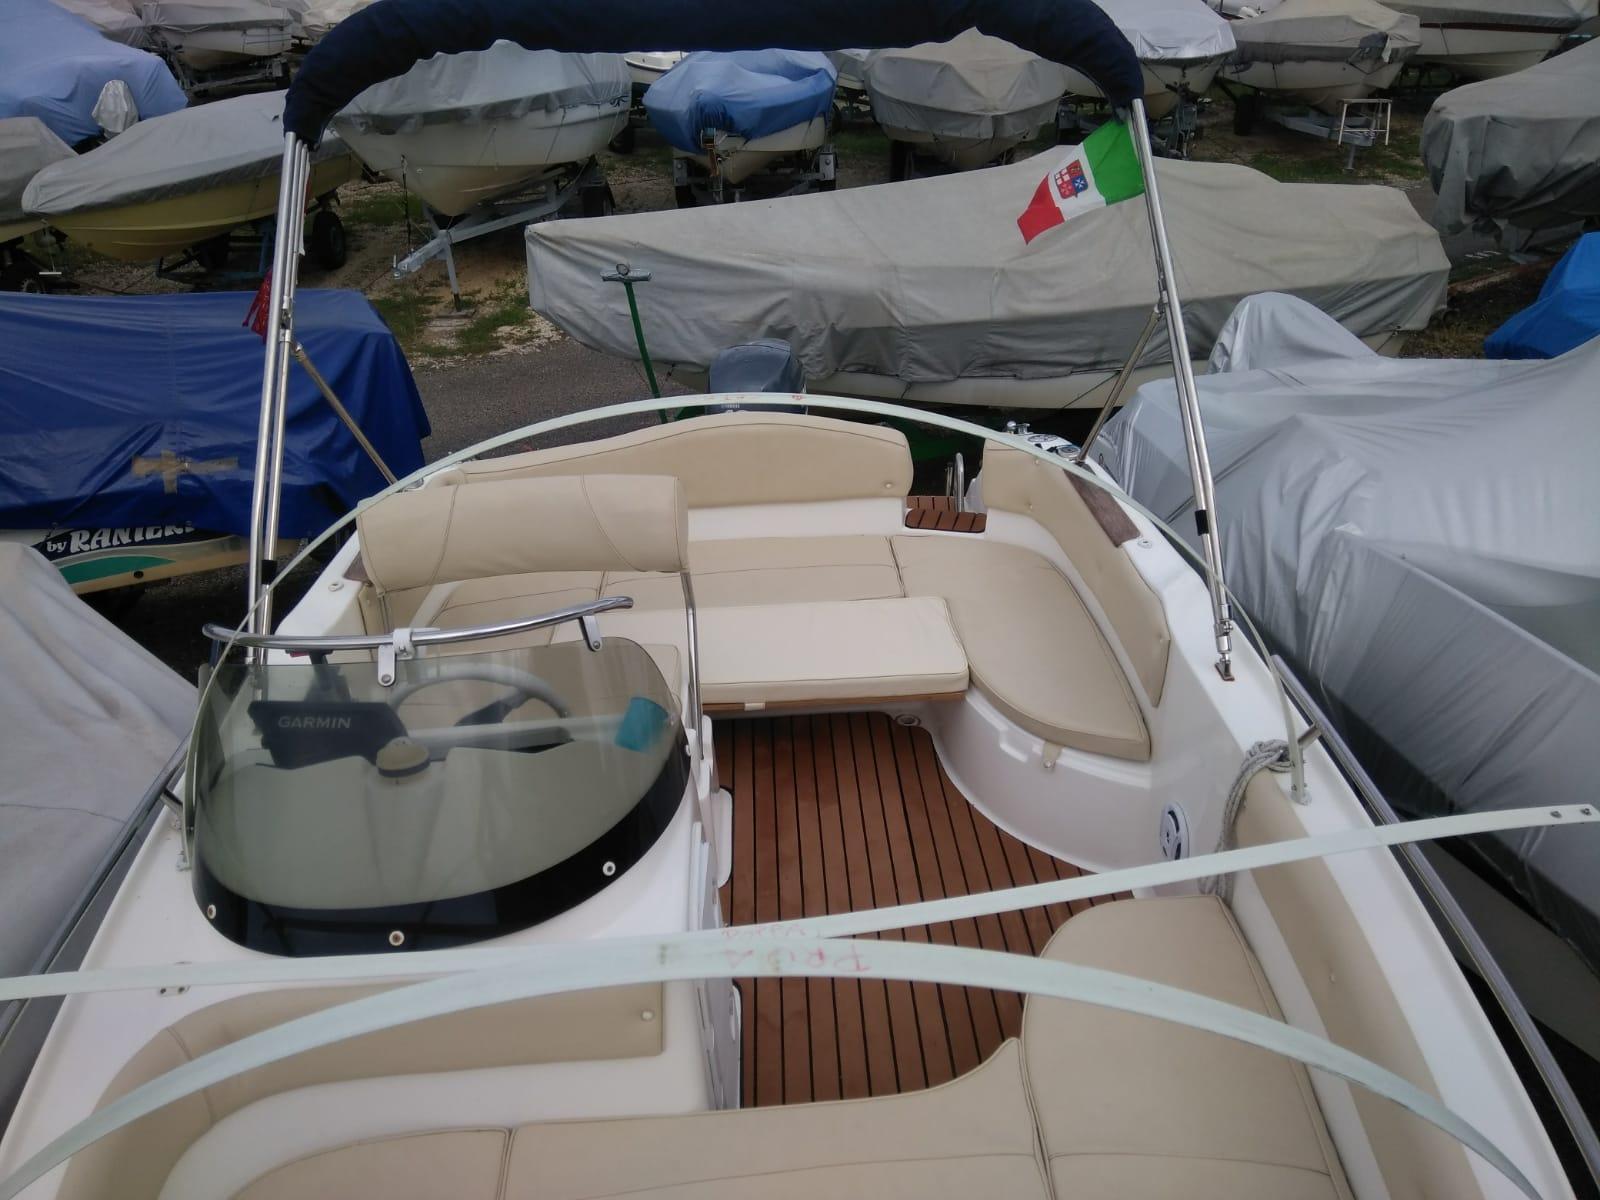 Foto Occasione Open Marinello 18 Eden FULL OPTIONAL + Yamaha F 40/60 - 4